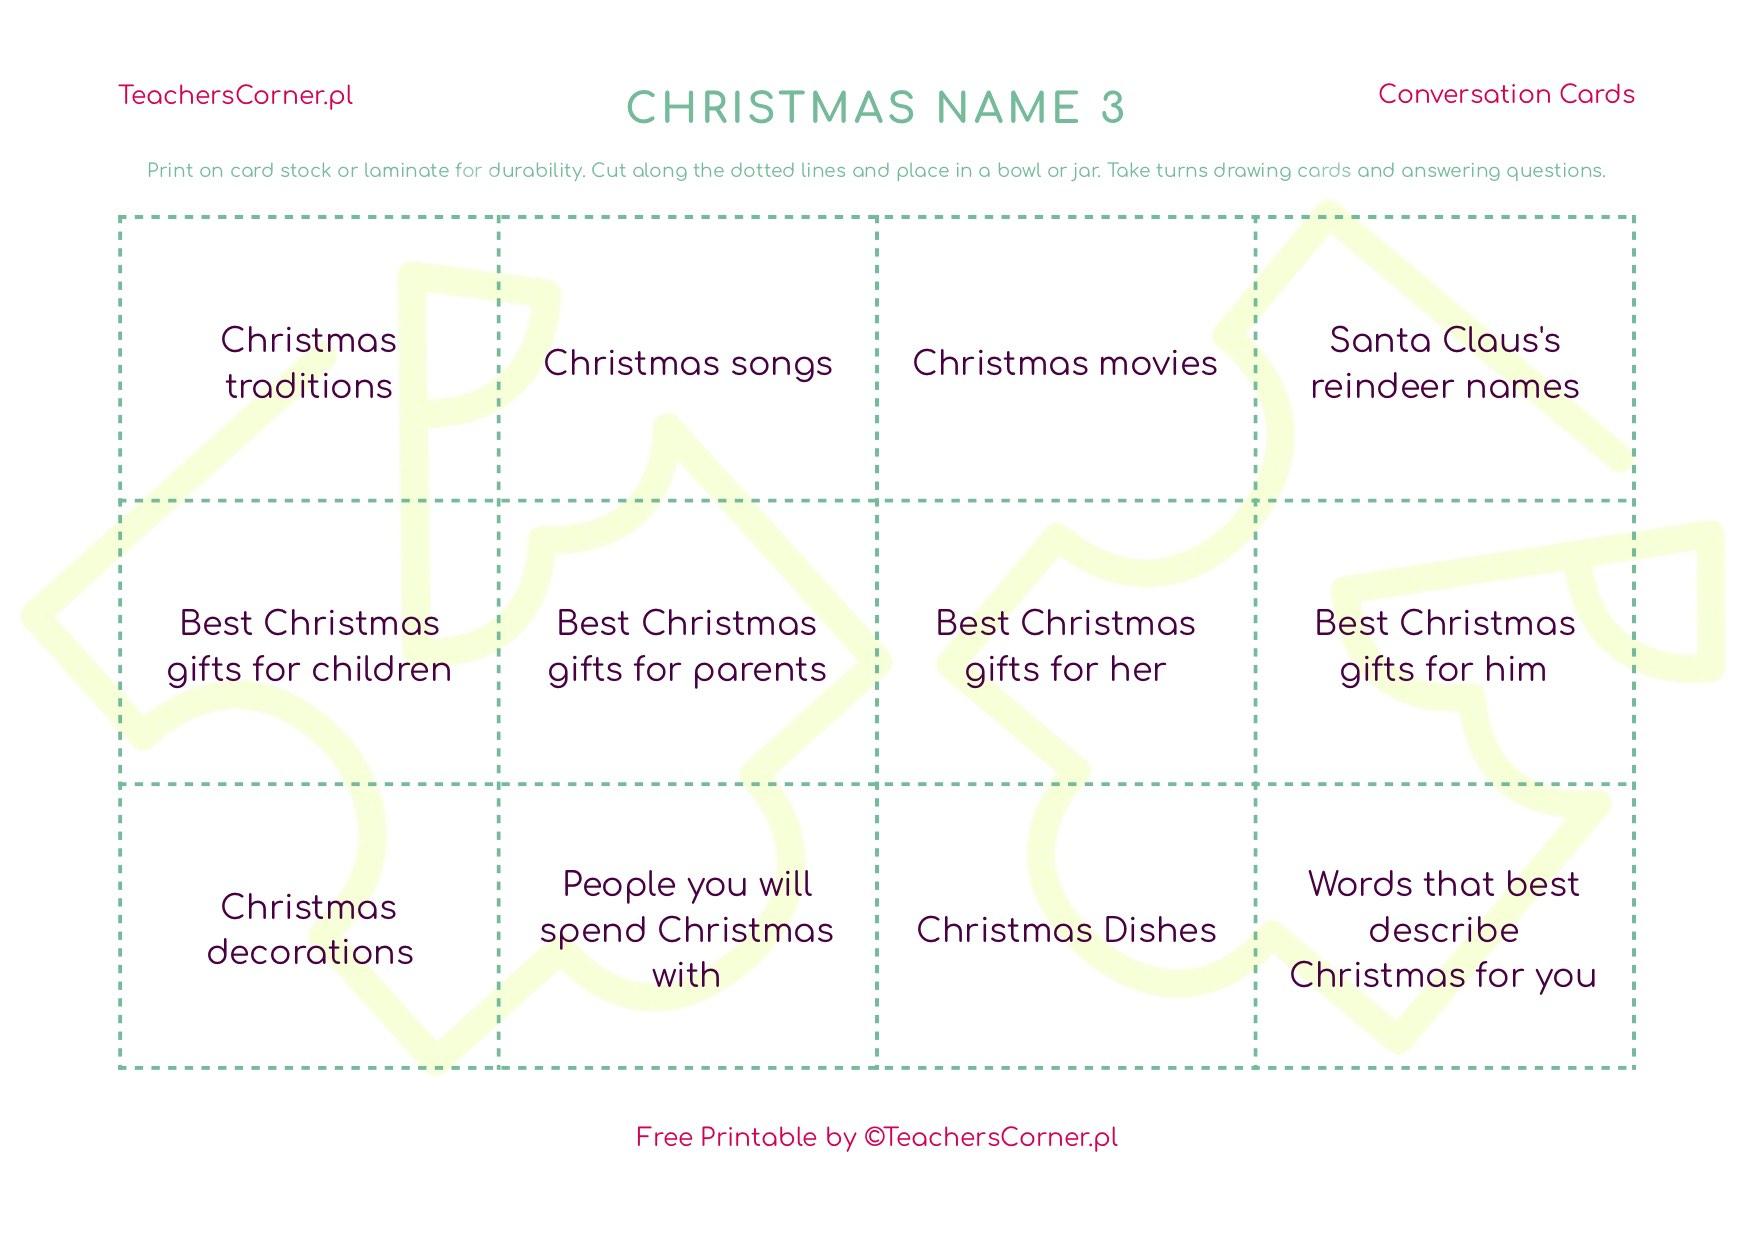 Christmas name 3 conversation cards